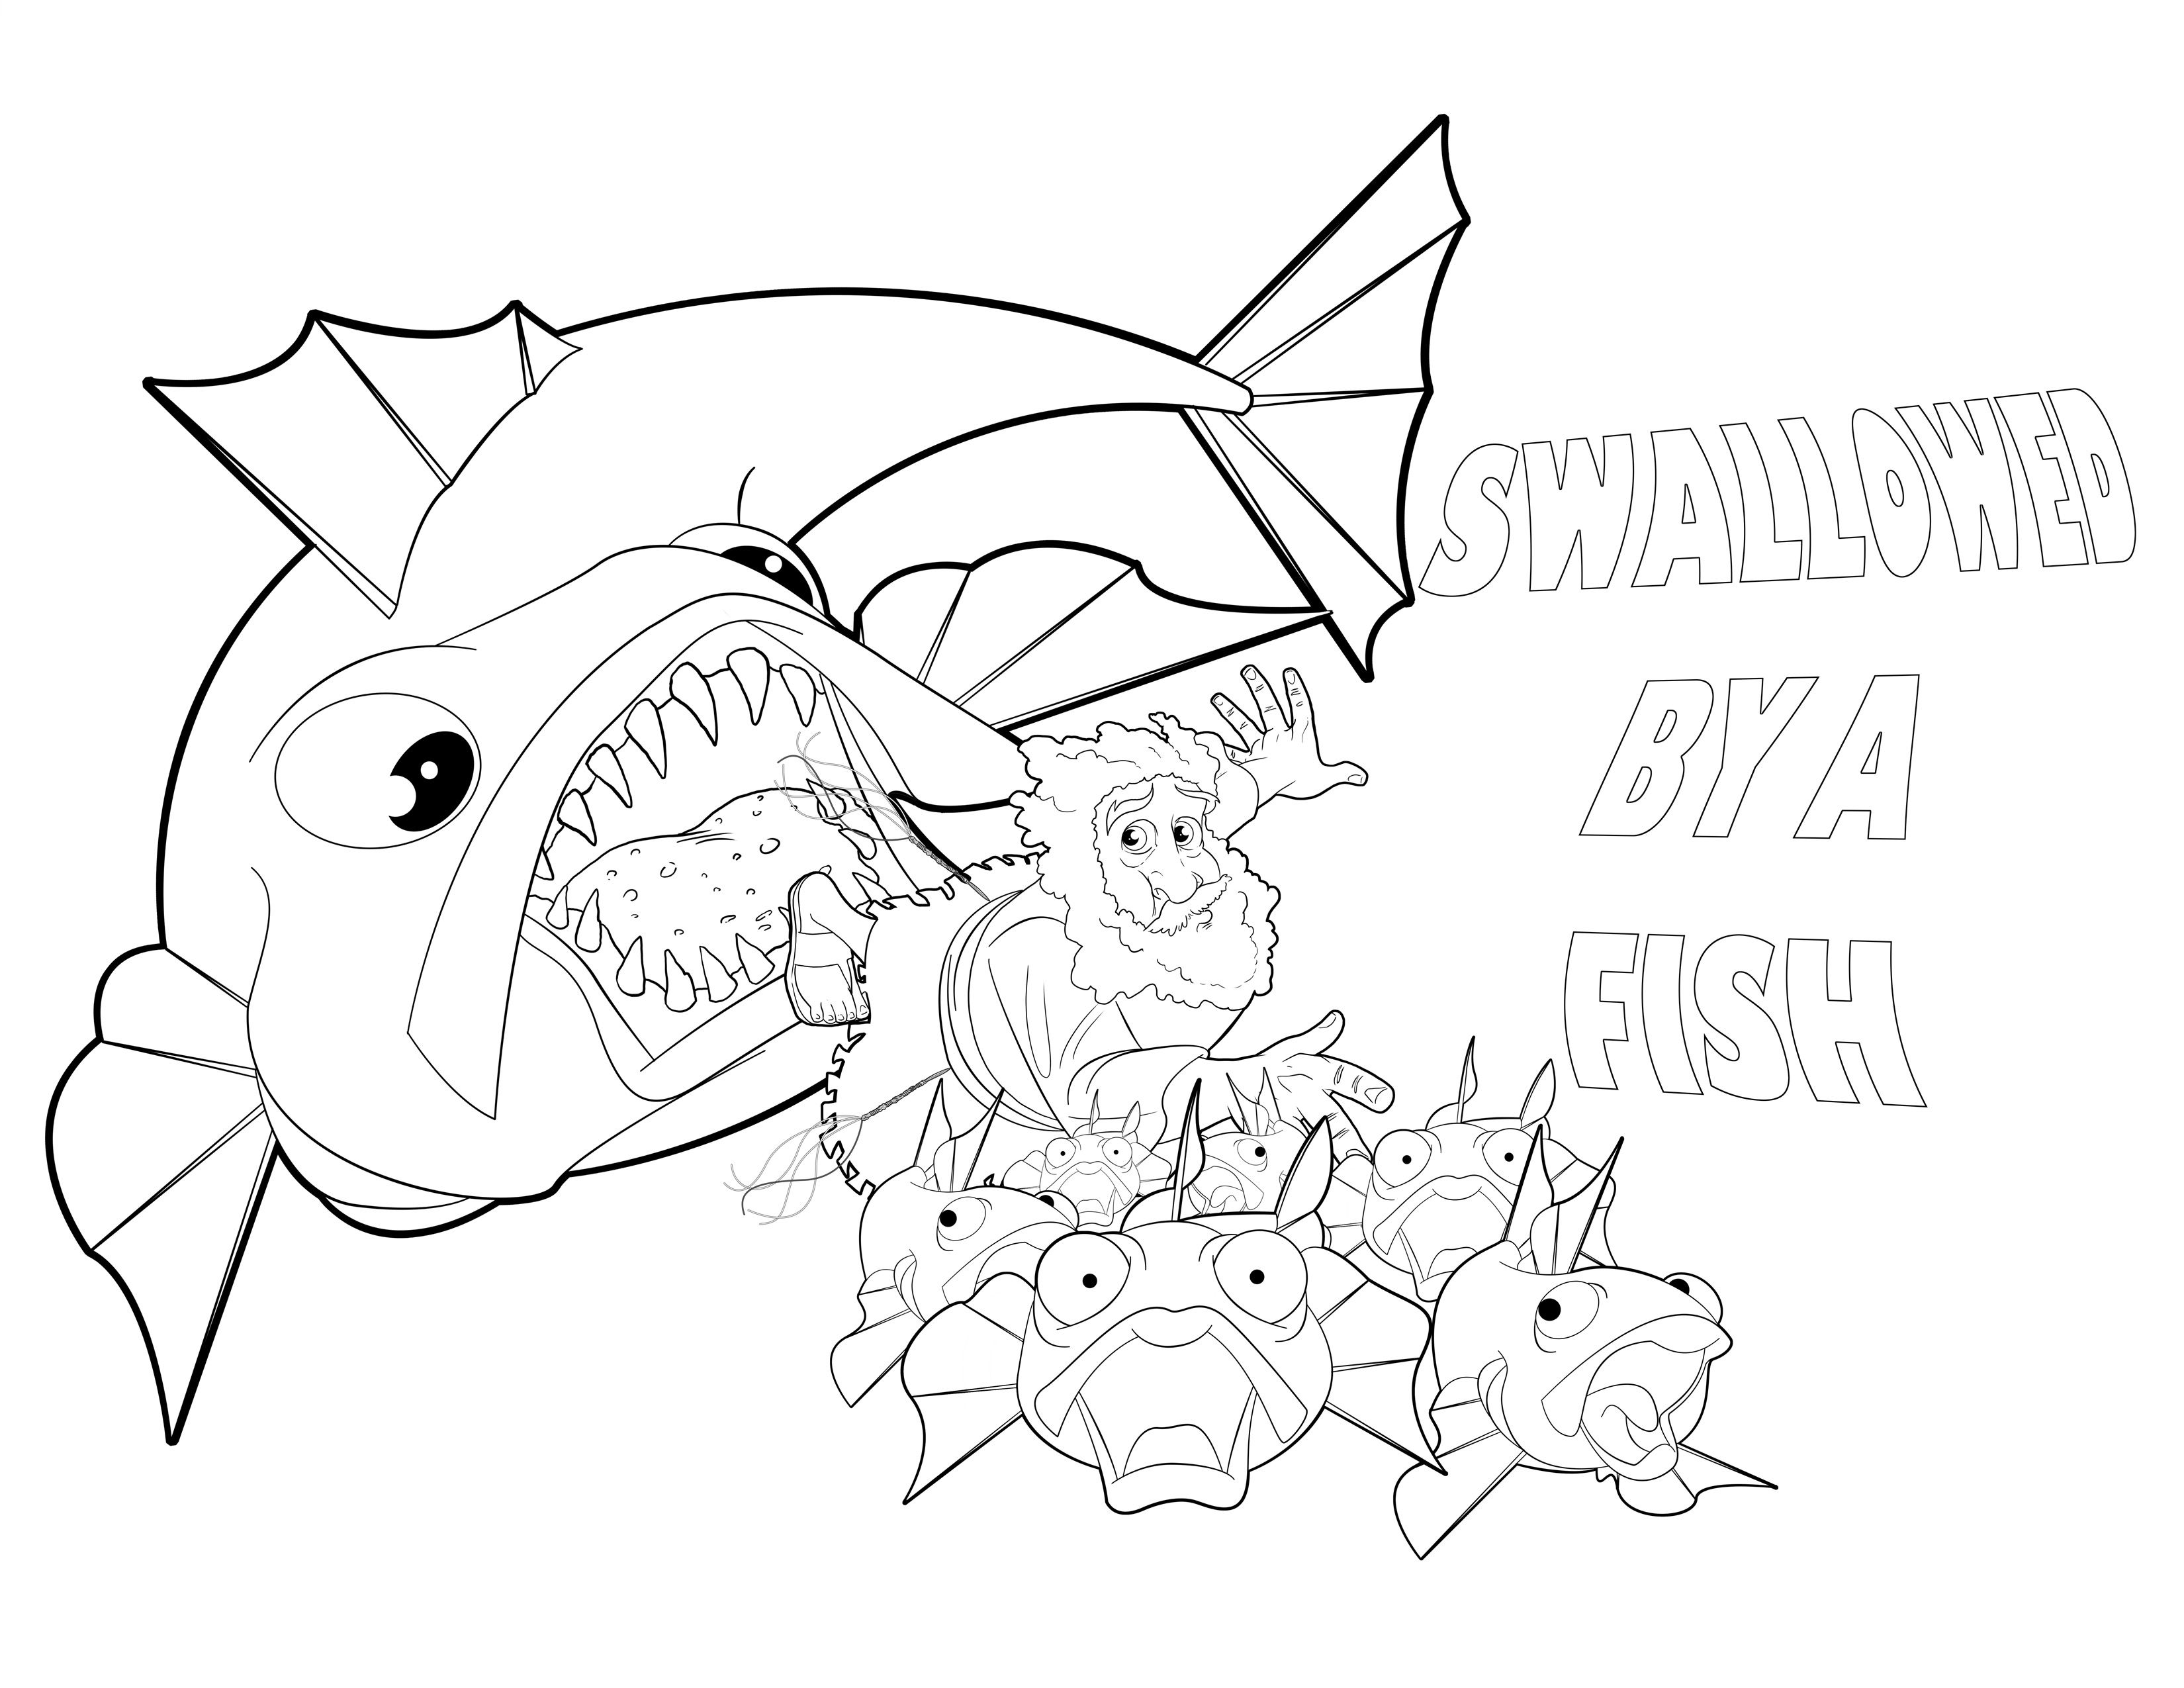 Bible Coloring Page: Jonah and the Big Fish